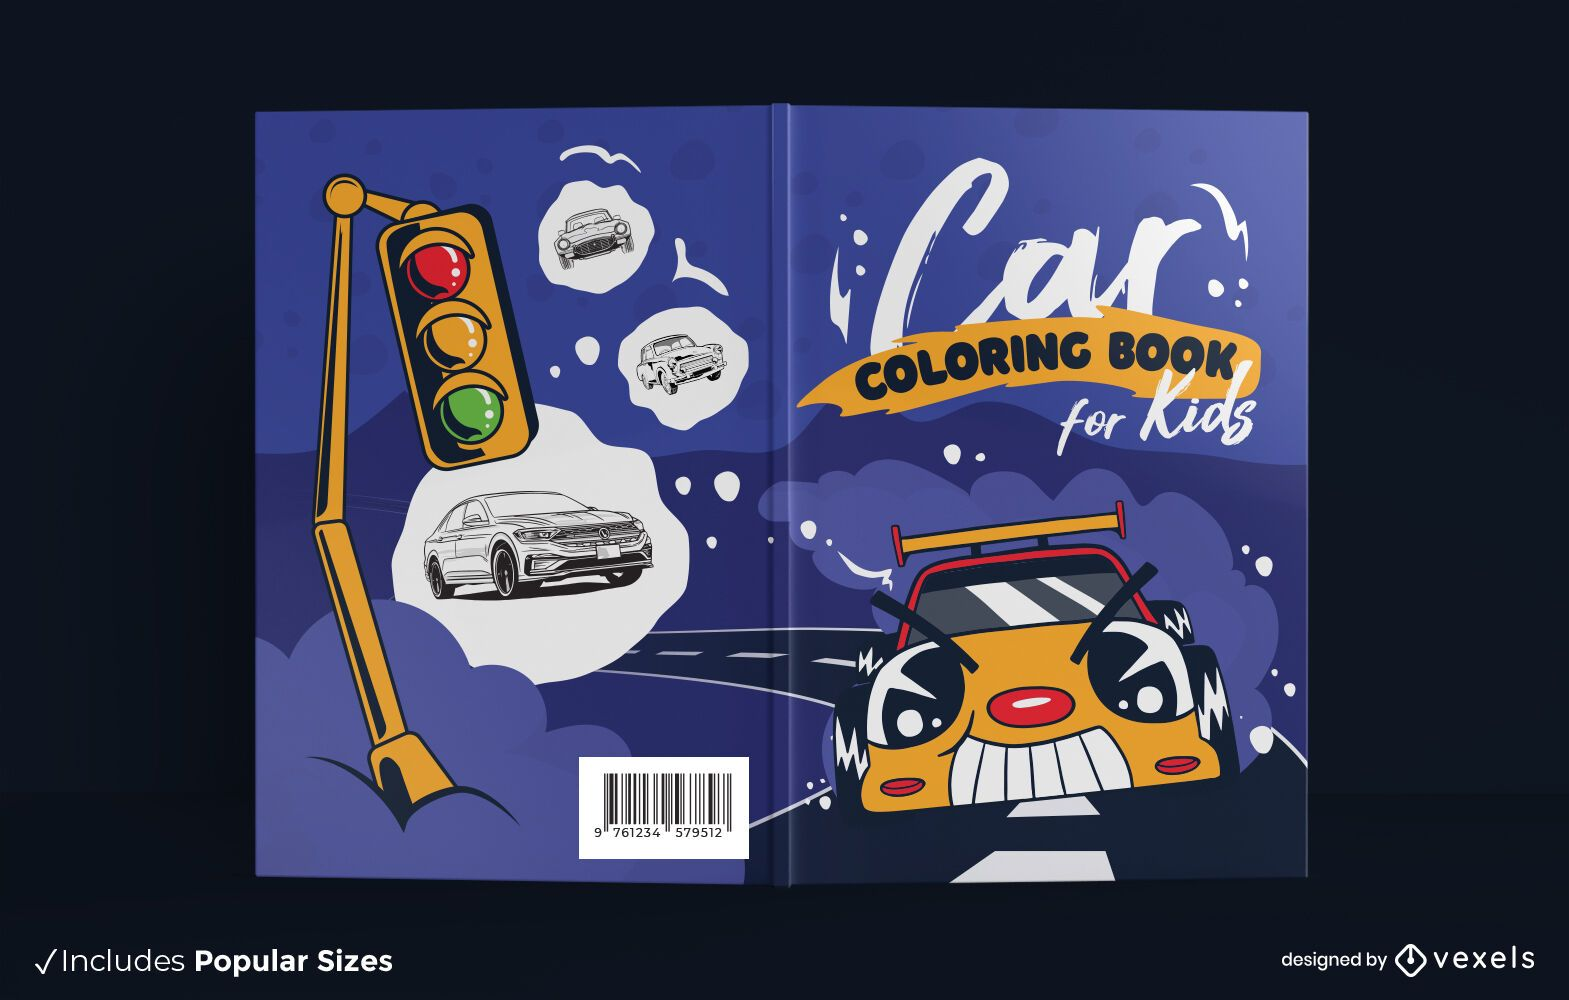 Car coloring book cover design